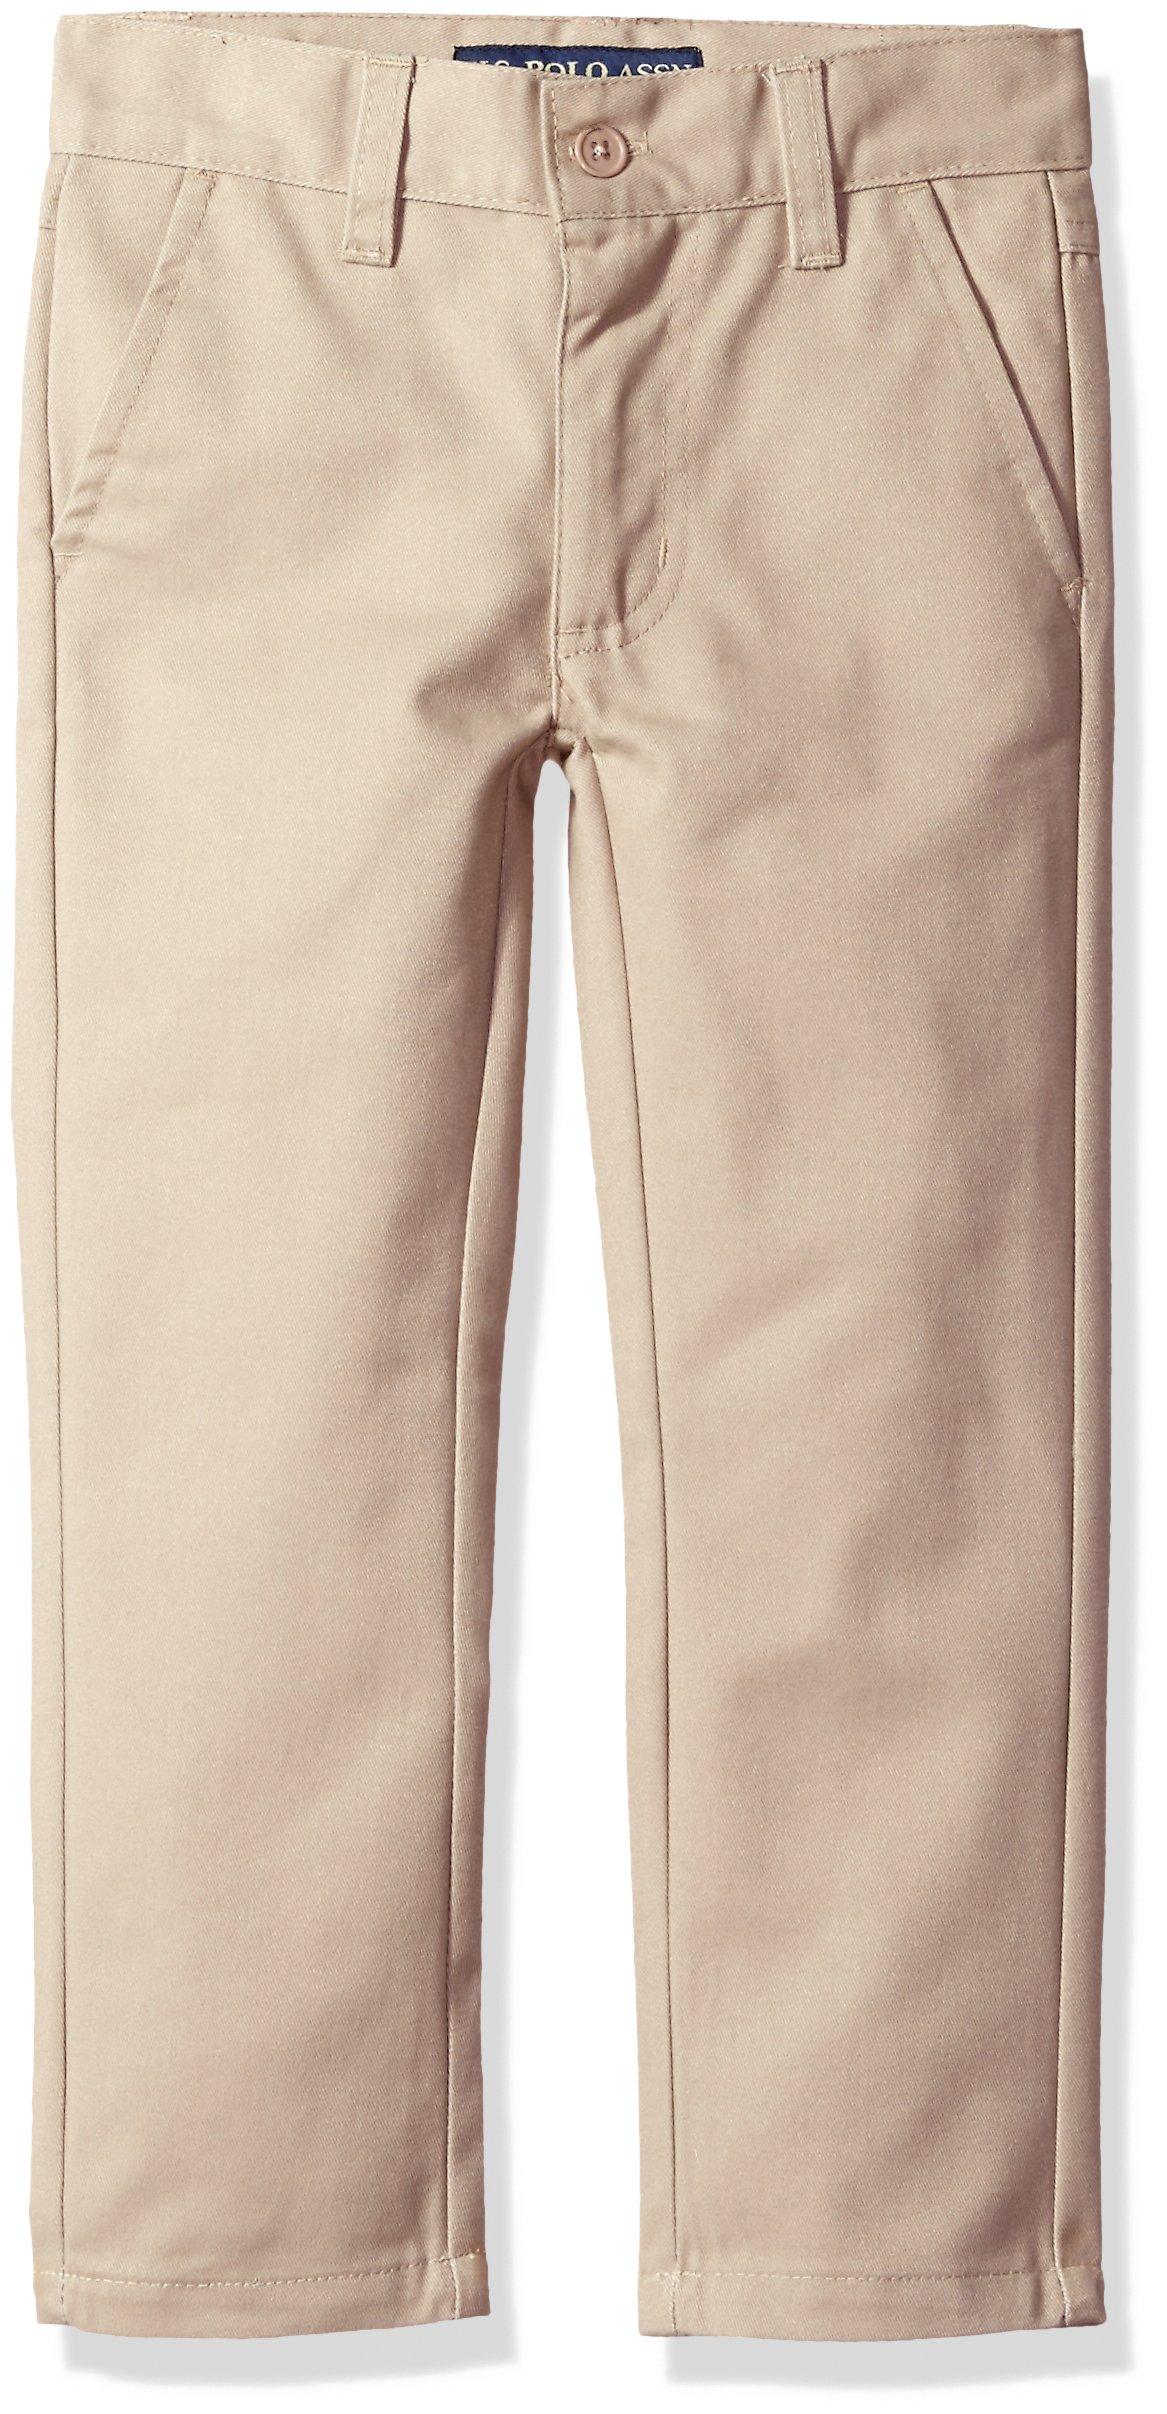 U.S. Polo Assn. Boys' Twill Pant (More Styles Available), Soft Khaki, 10